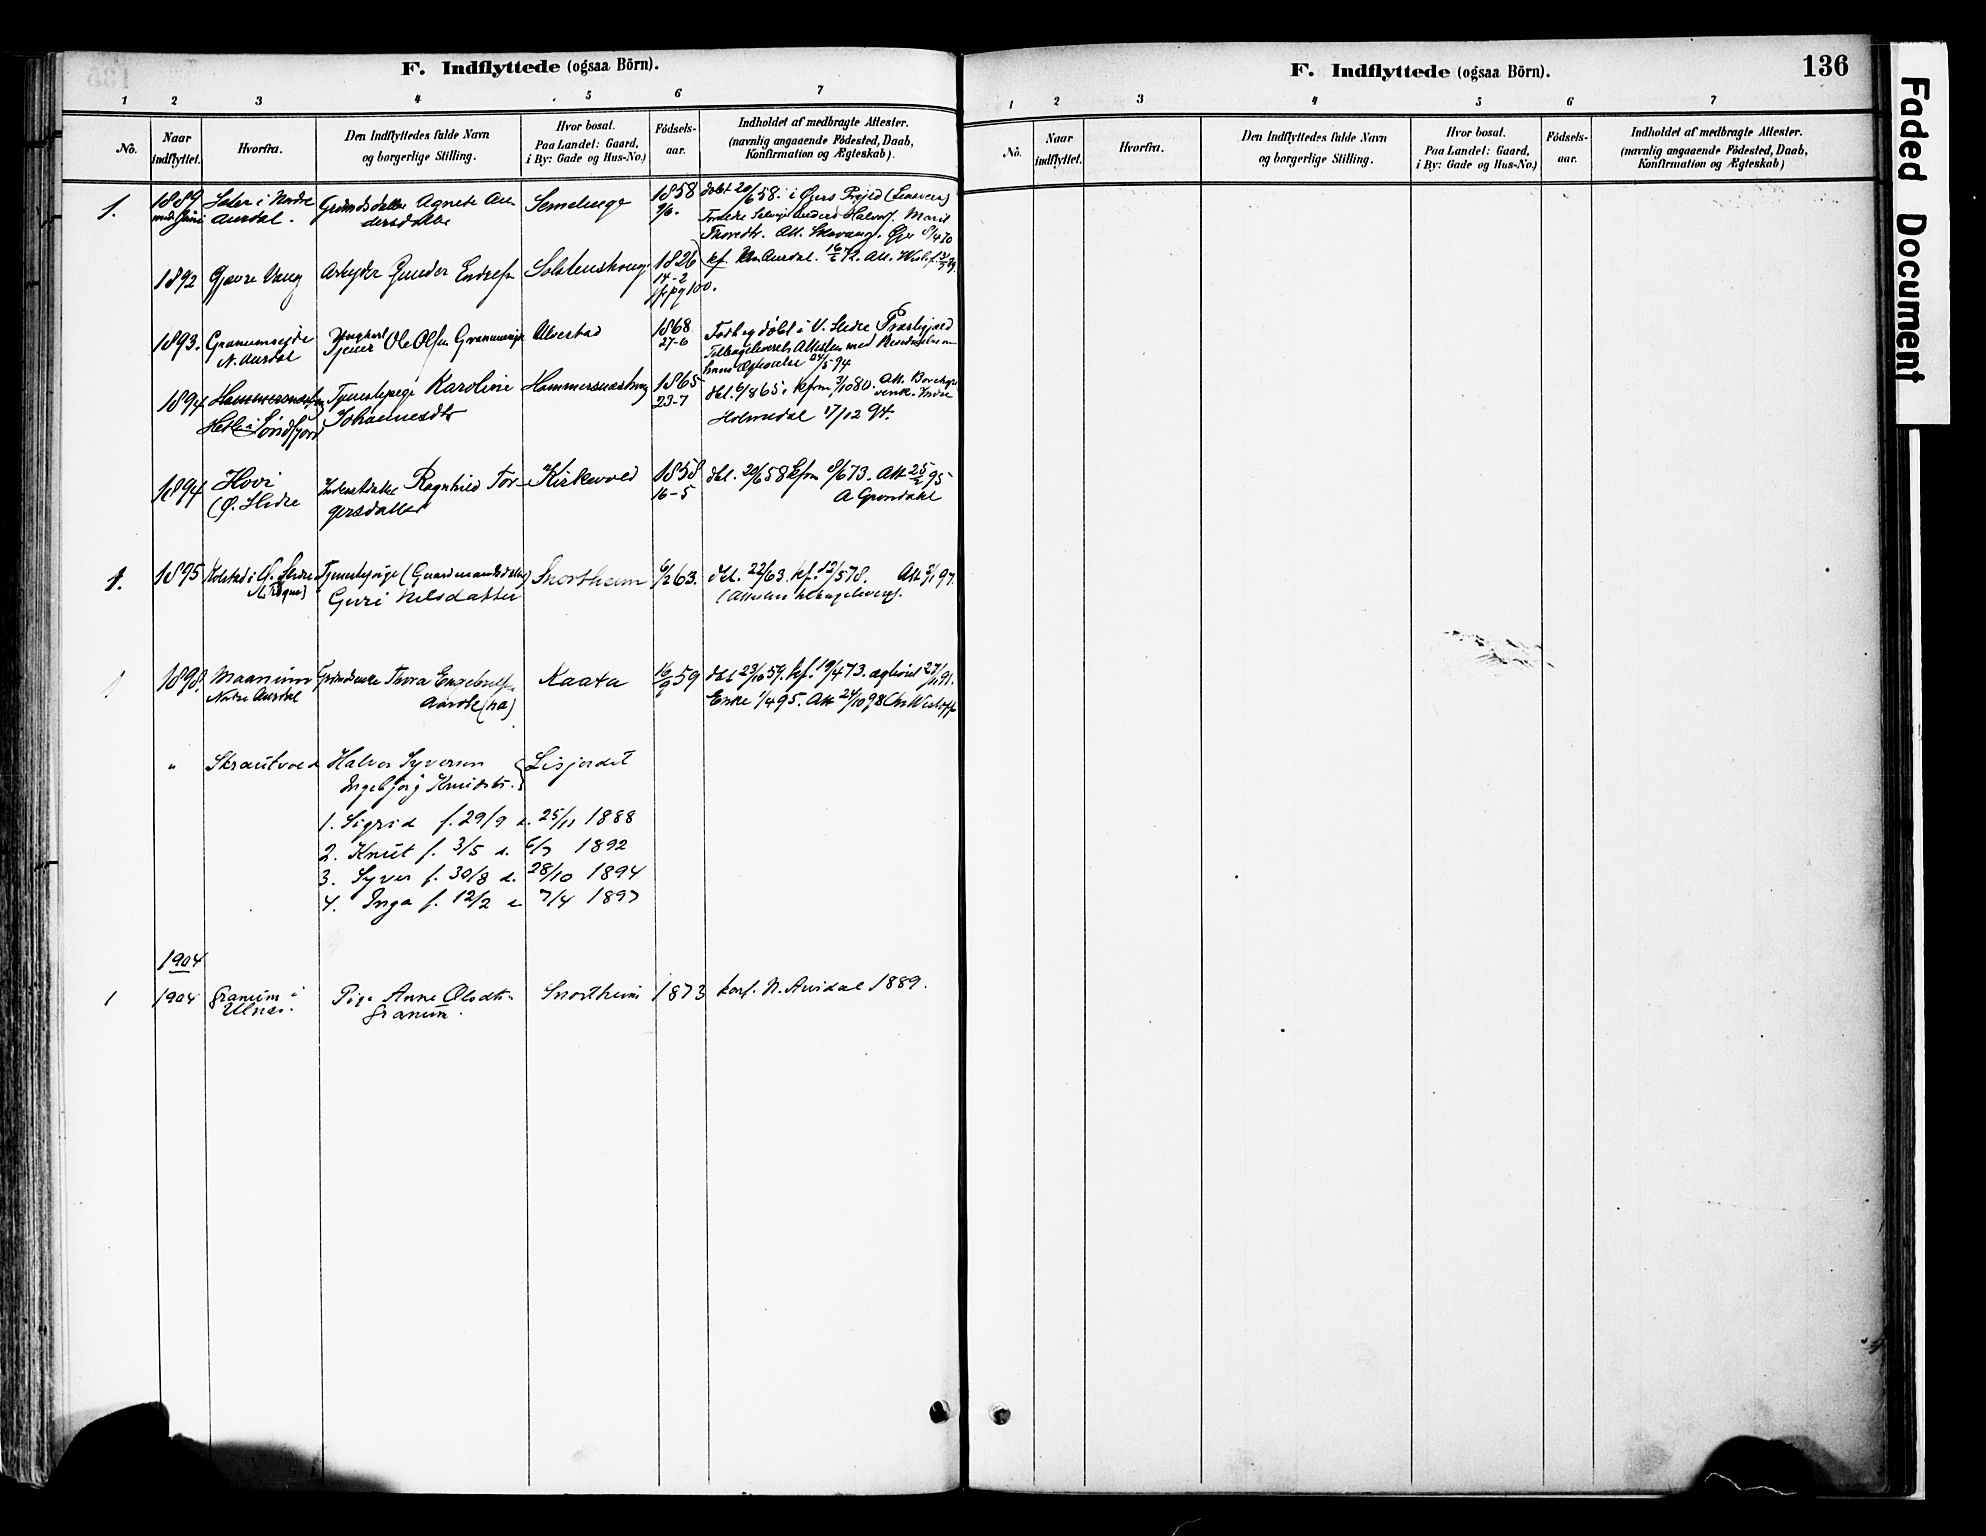 SAH, Vestre Slidre prestekontor, Ministerialbok nr. 6, 1881-1912, s. 136